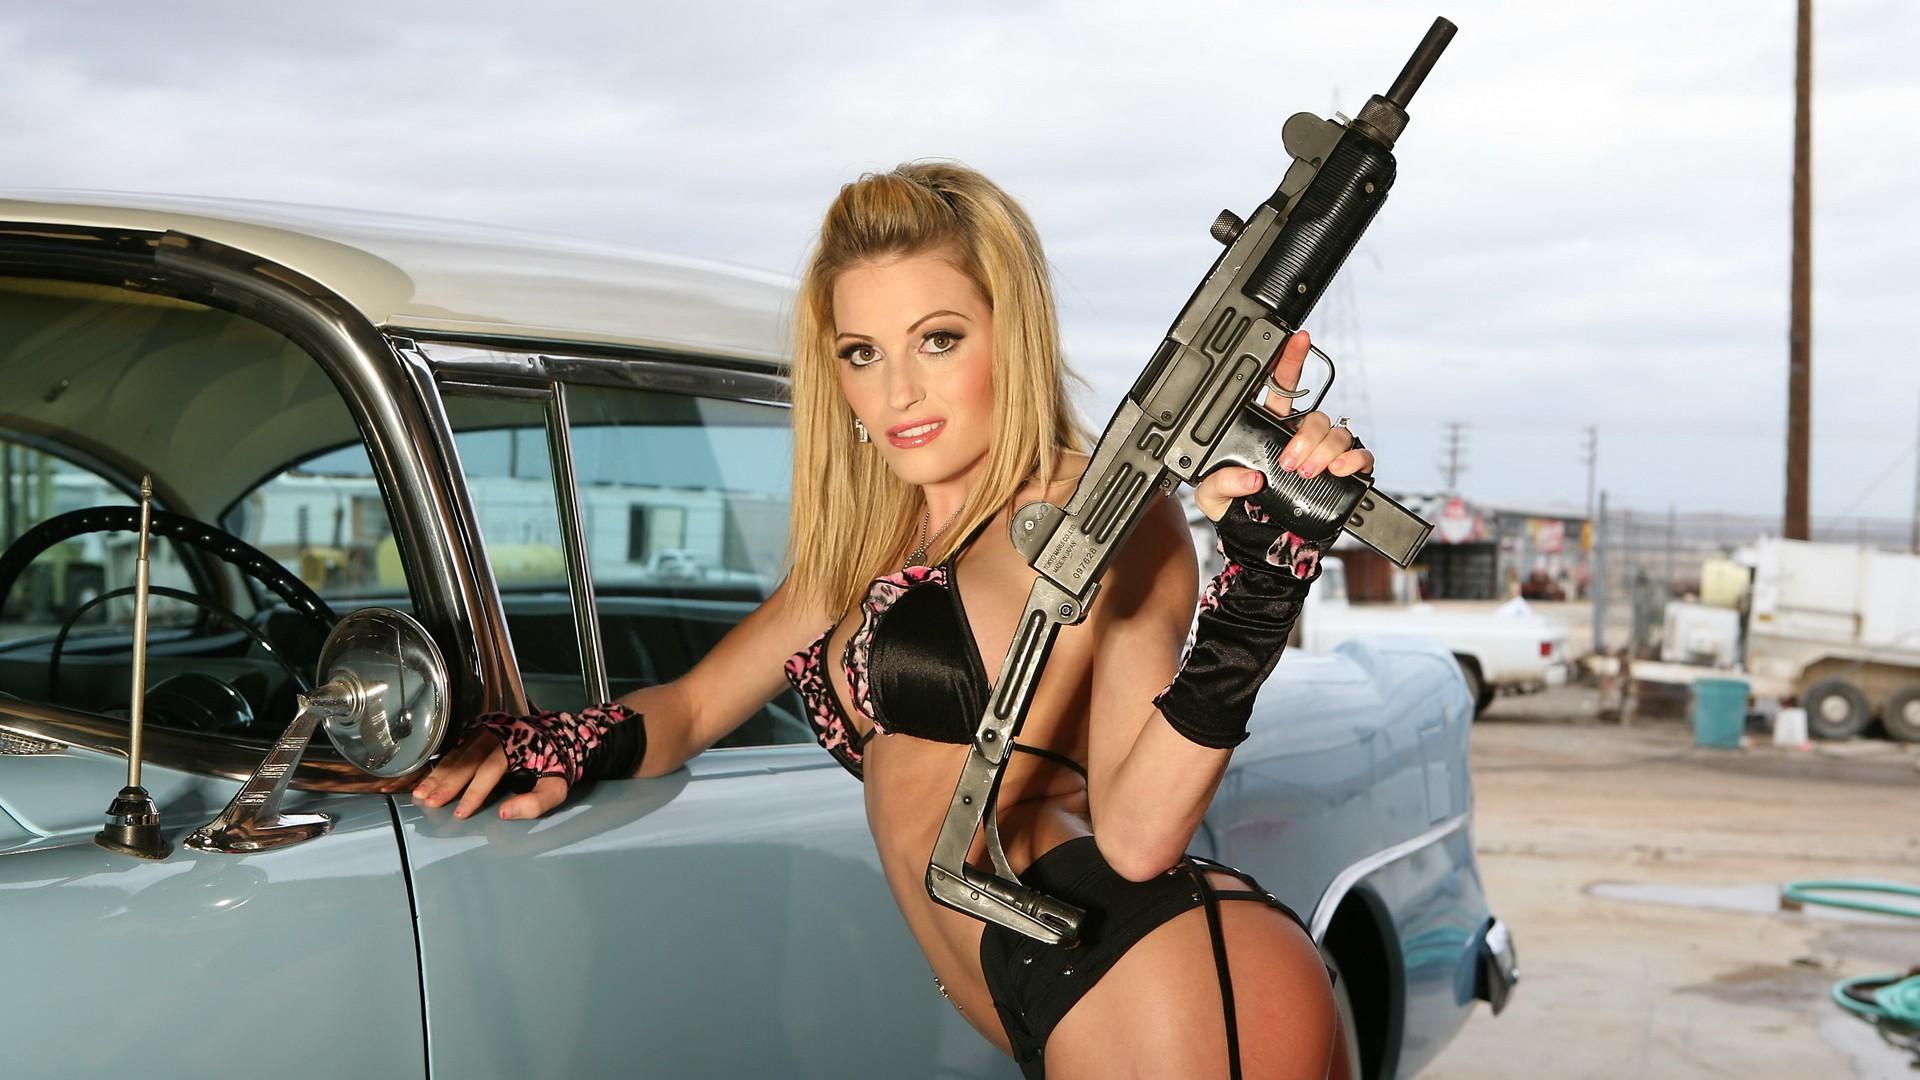 Copia di hot girl with gun widescreen full hd wallpaper